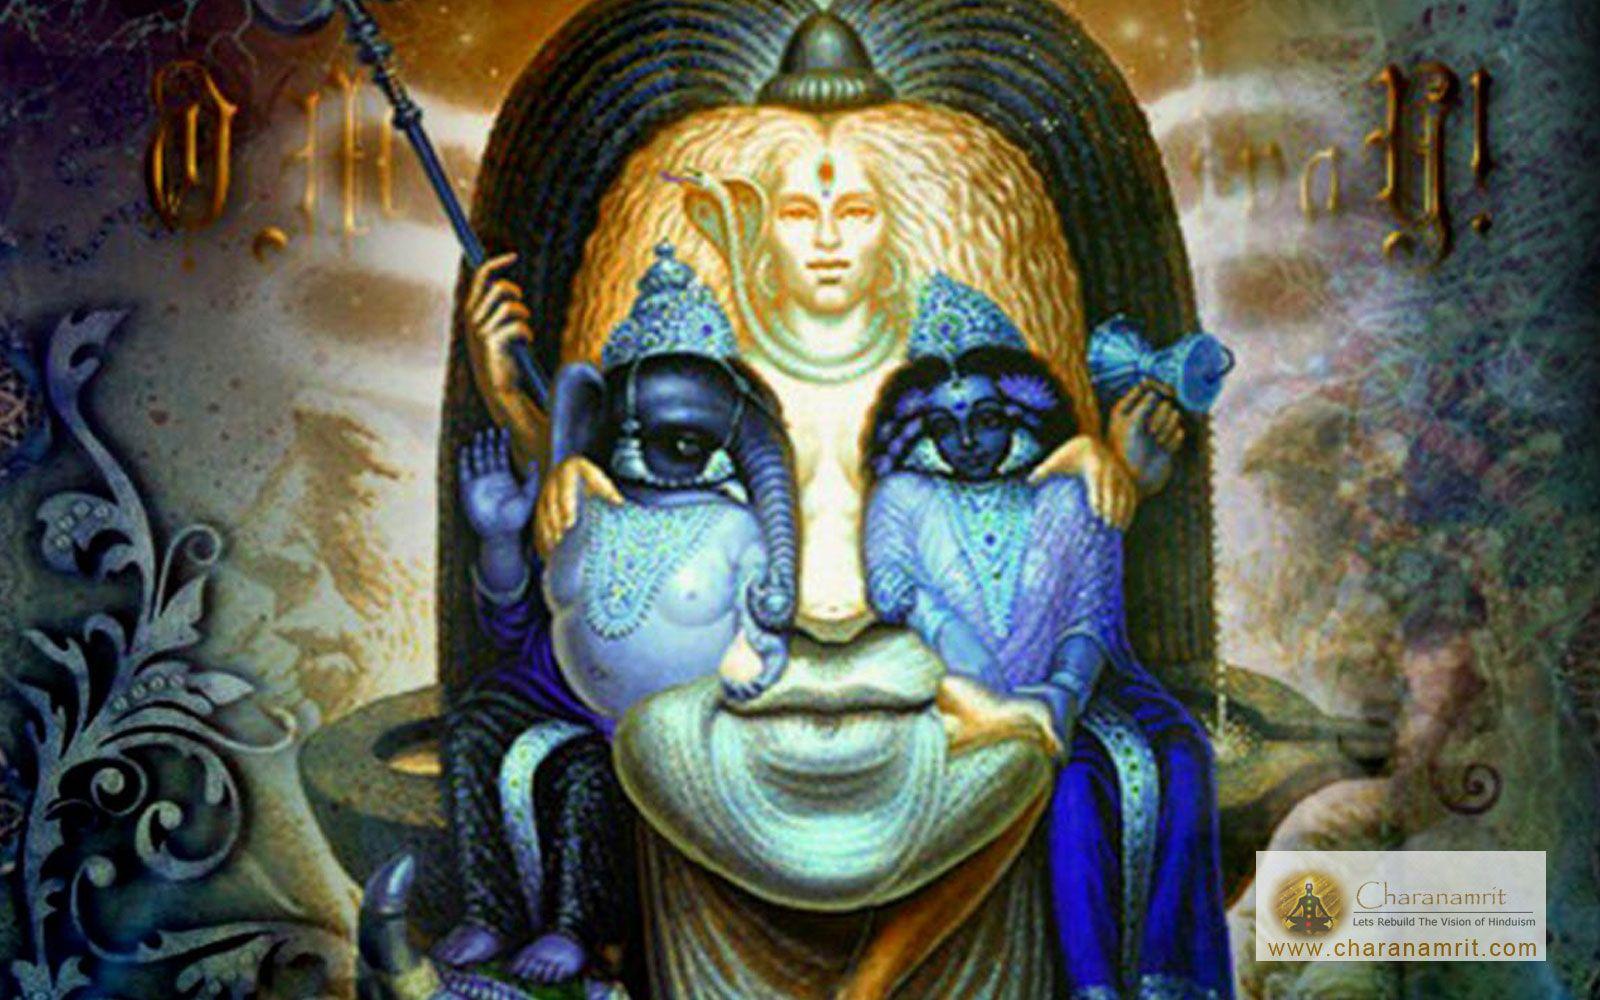 Hd wallpaper bholenath - Get Beautiful Stylish Wallpapers Of Maha Shivratri Bhole Baba Shiv Shankar Bhole Nath